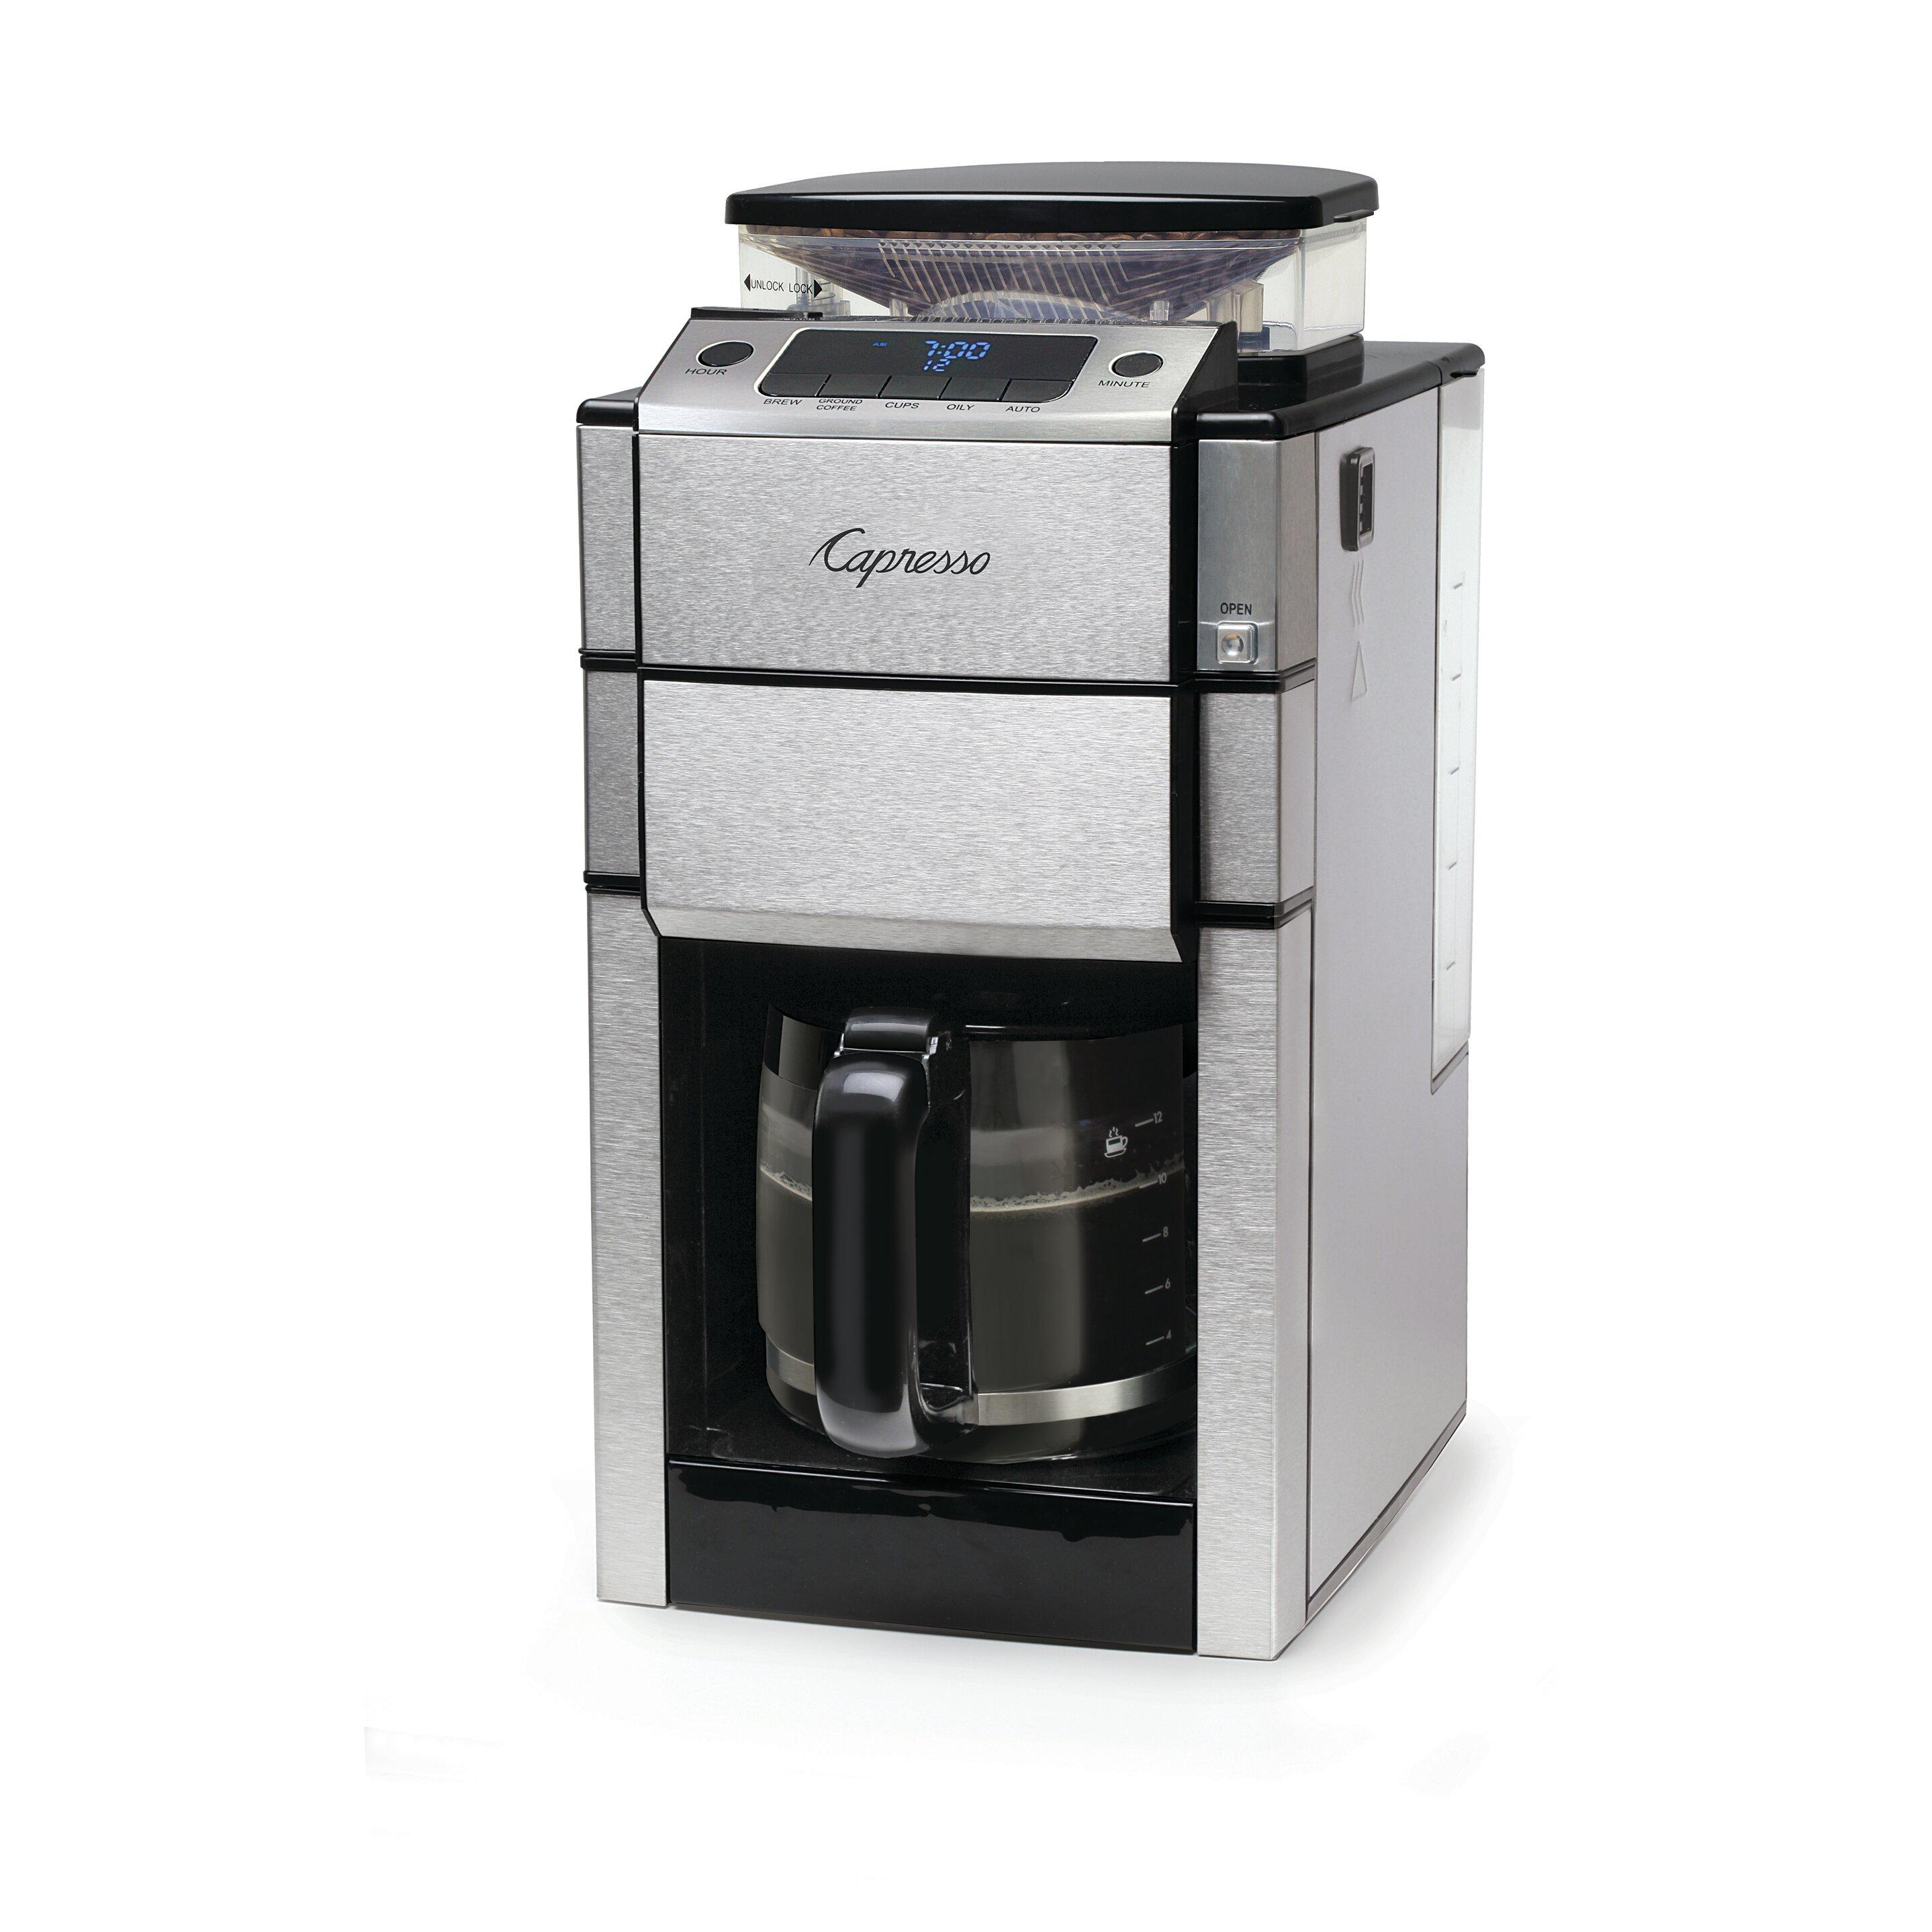 Pro Coffee Maker ~ Capresso coffee team pro plus maker reviews wayfair